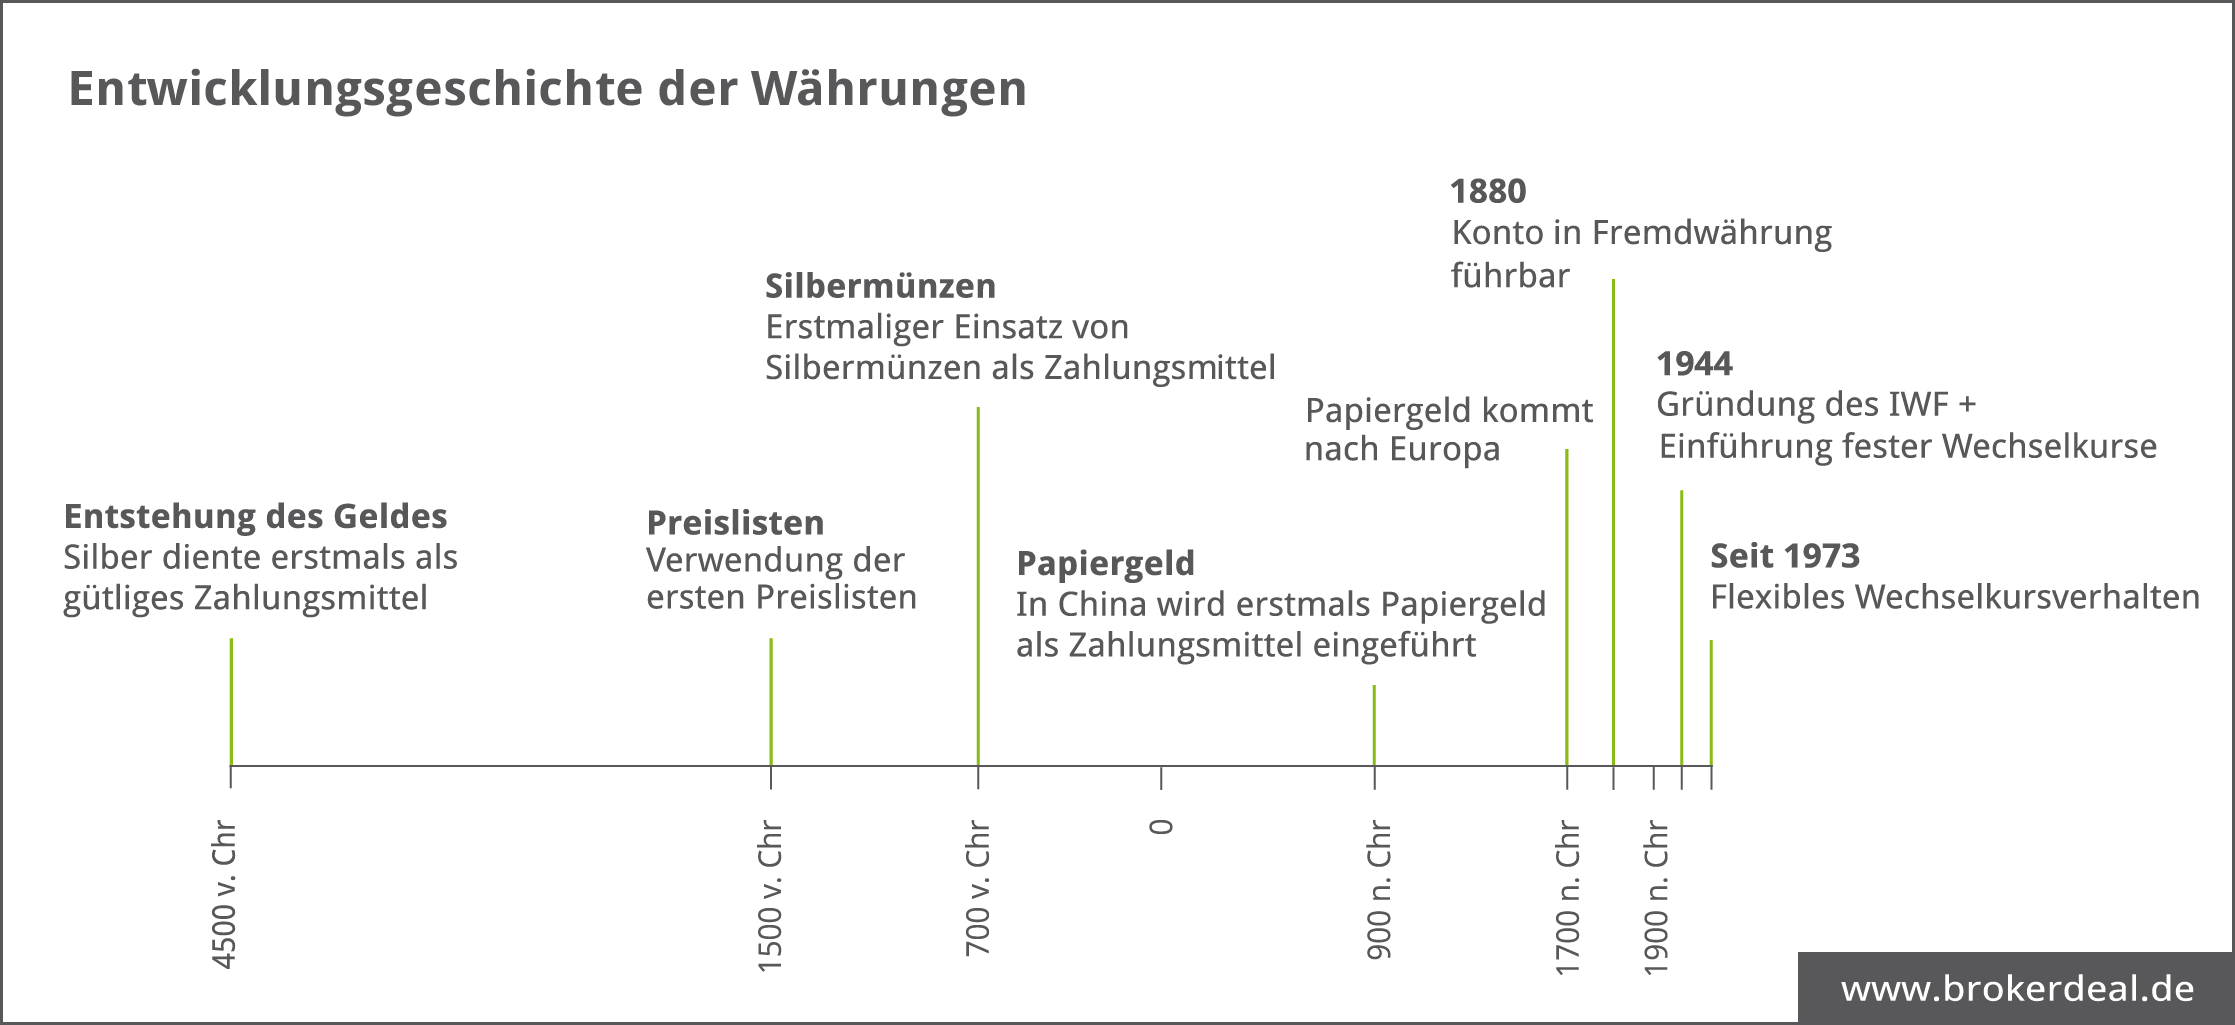 entwicklungsgeschichte-waehrungen